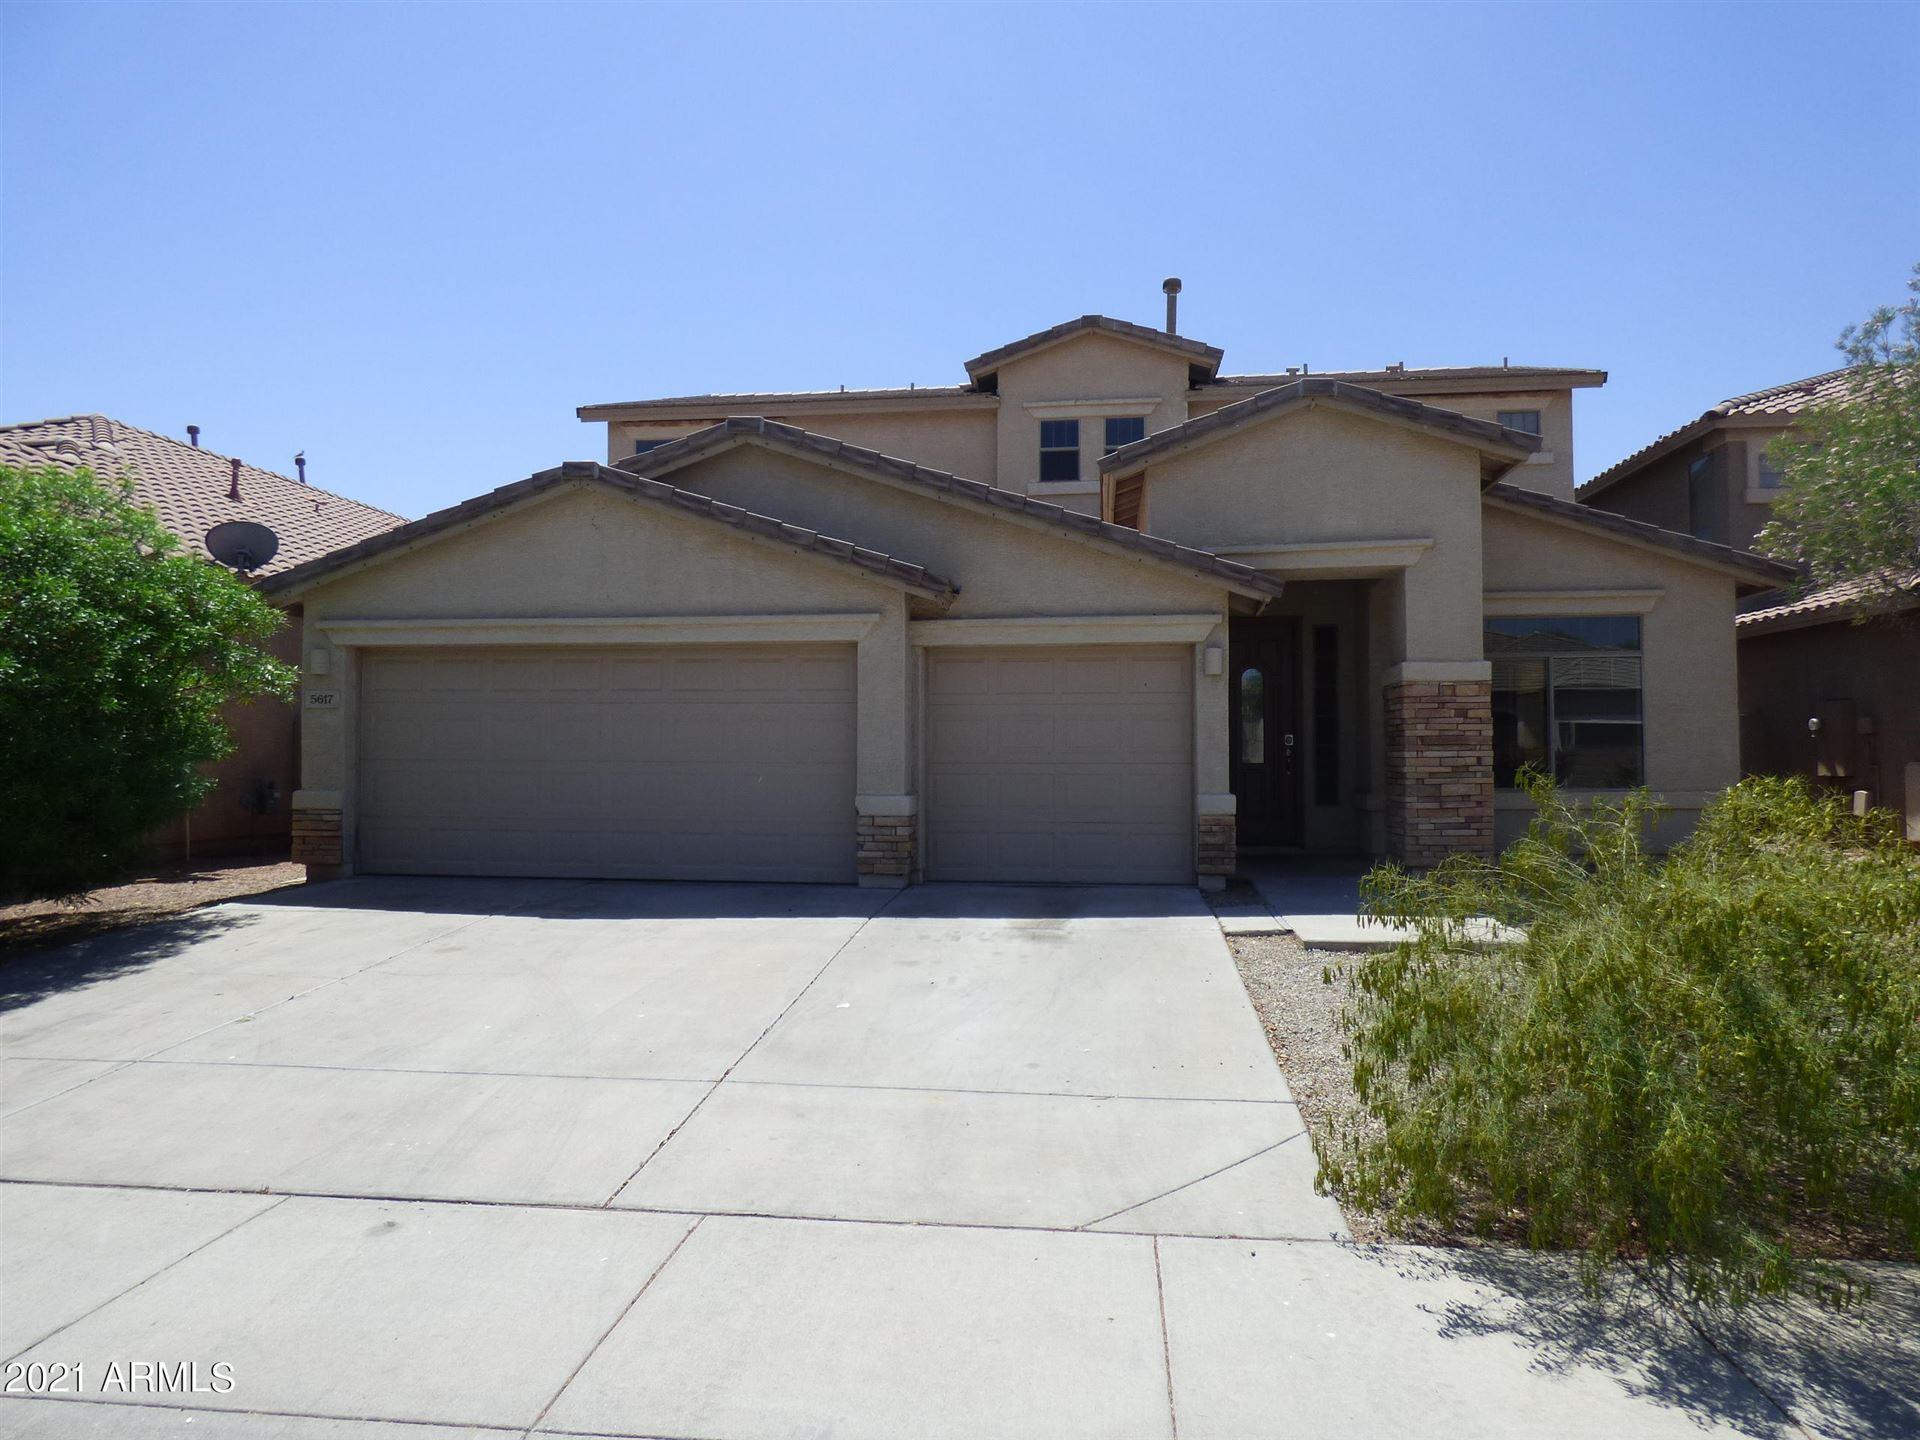 5617 W CARSON Road, Laveen, AZ 85339 - MLS#: 6234542